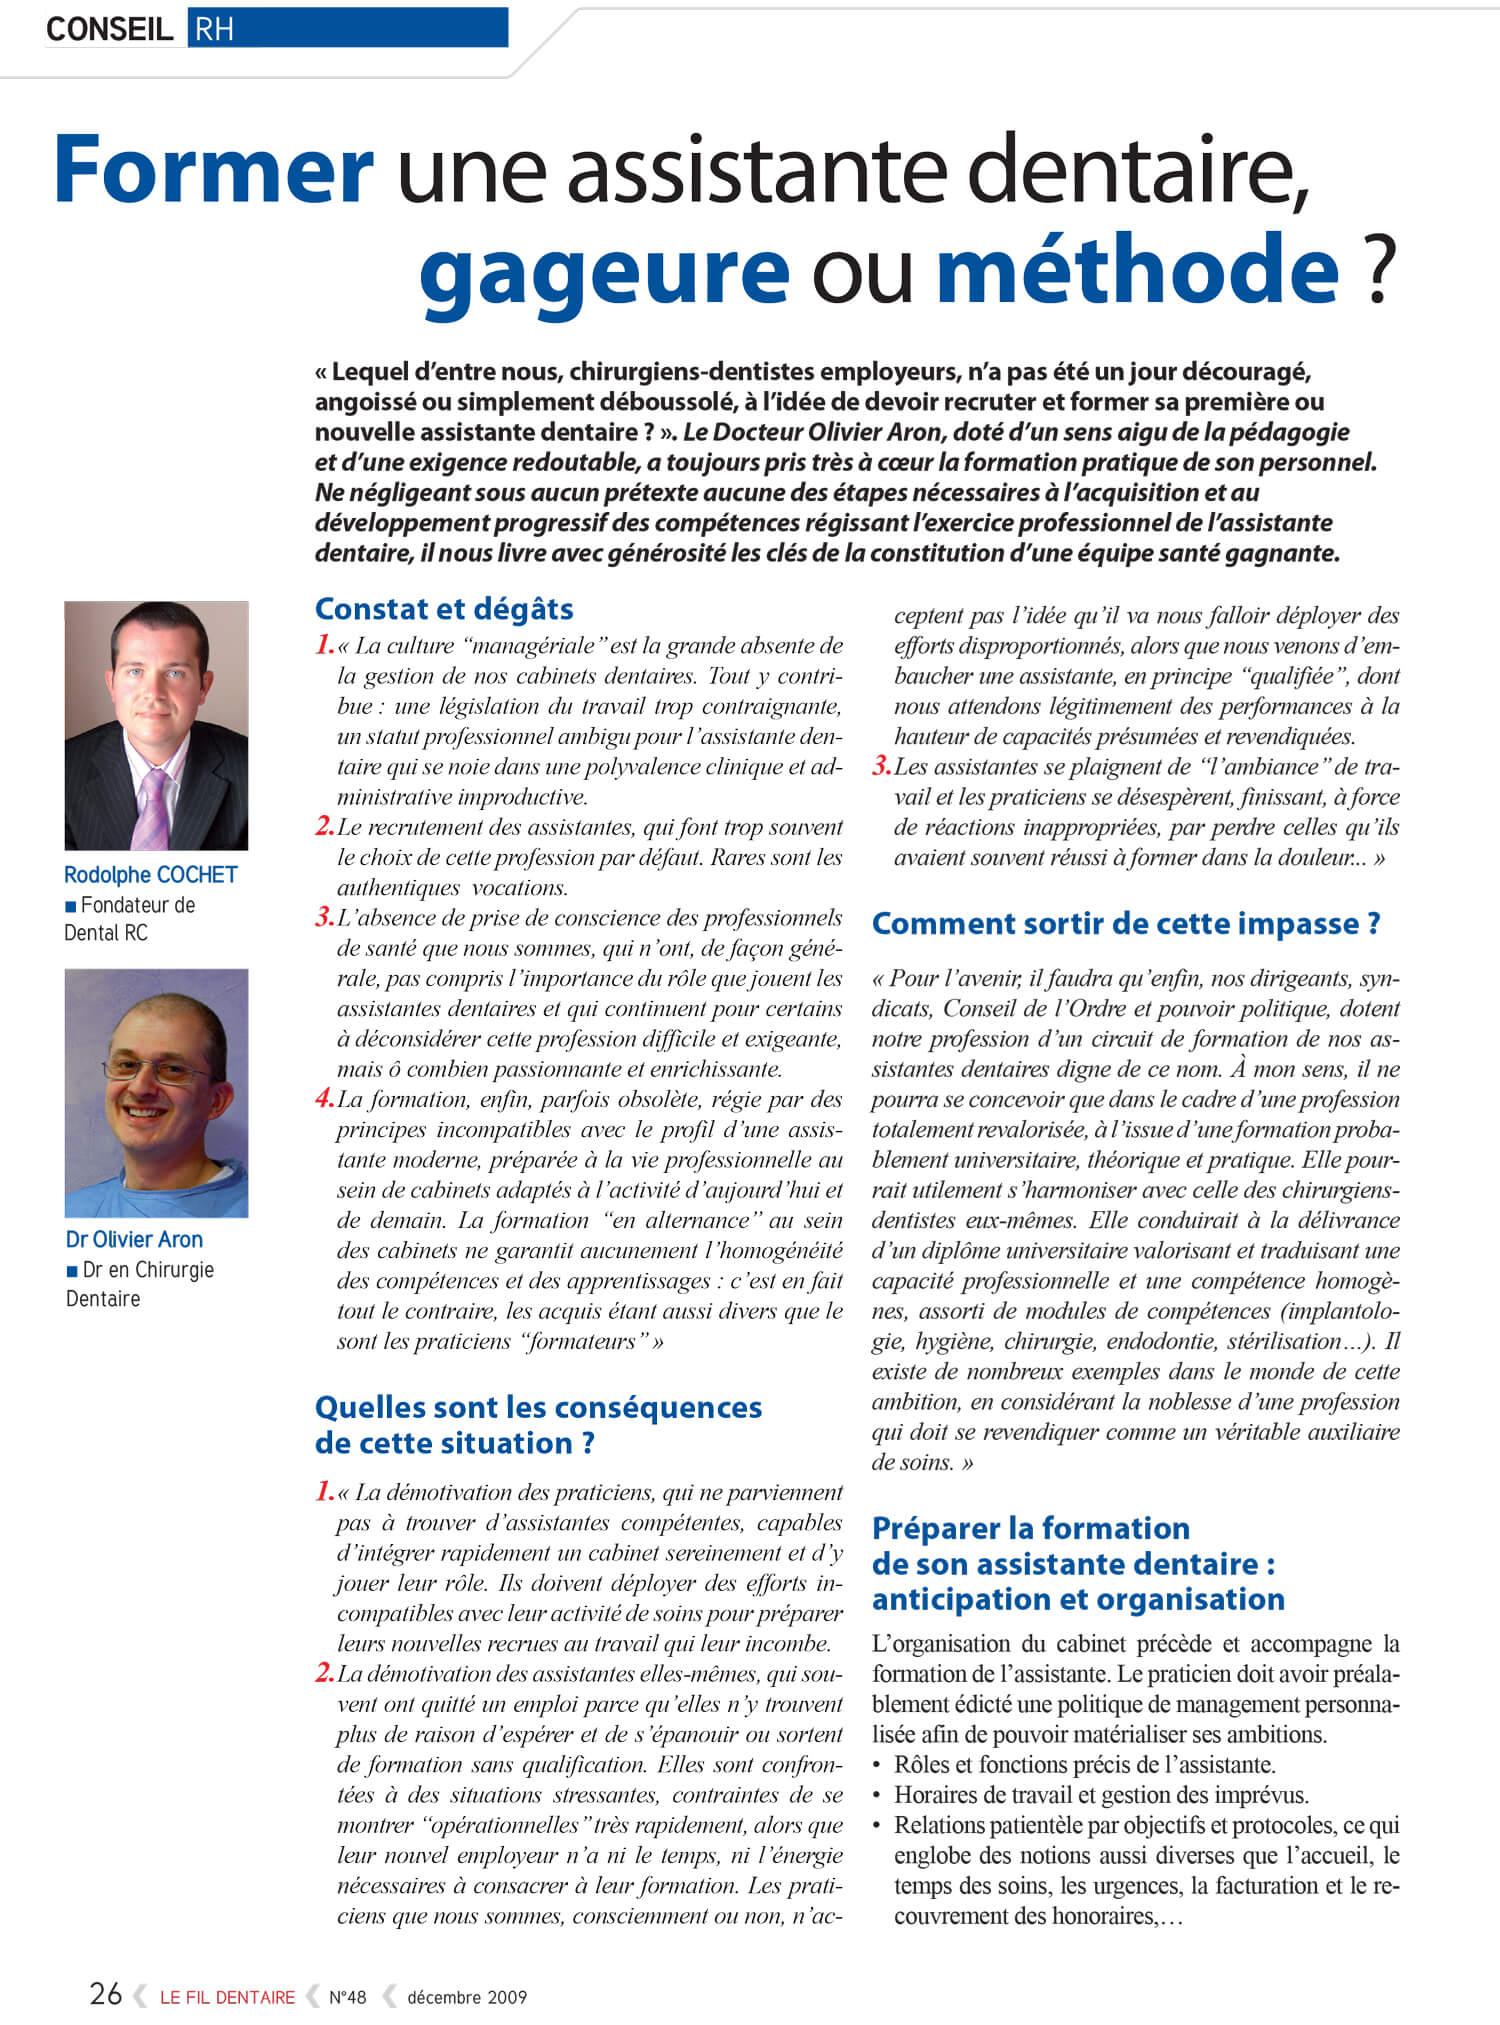 Former-formation-assistante-dentaire-Rodolphe-Cochet-Docteur-Olivier-Aron.jpg